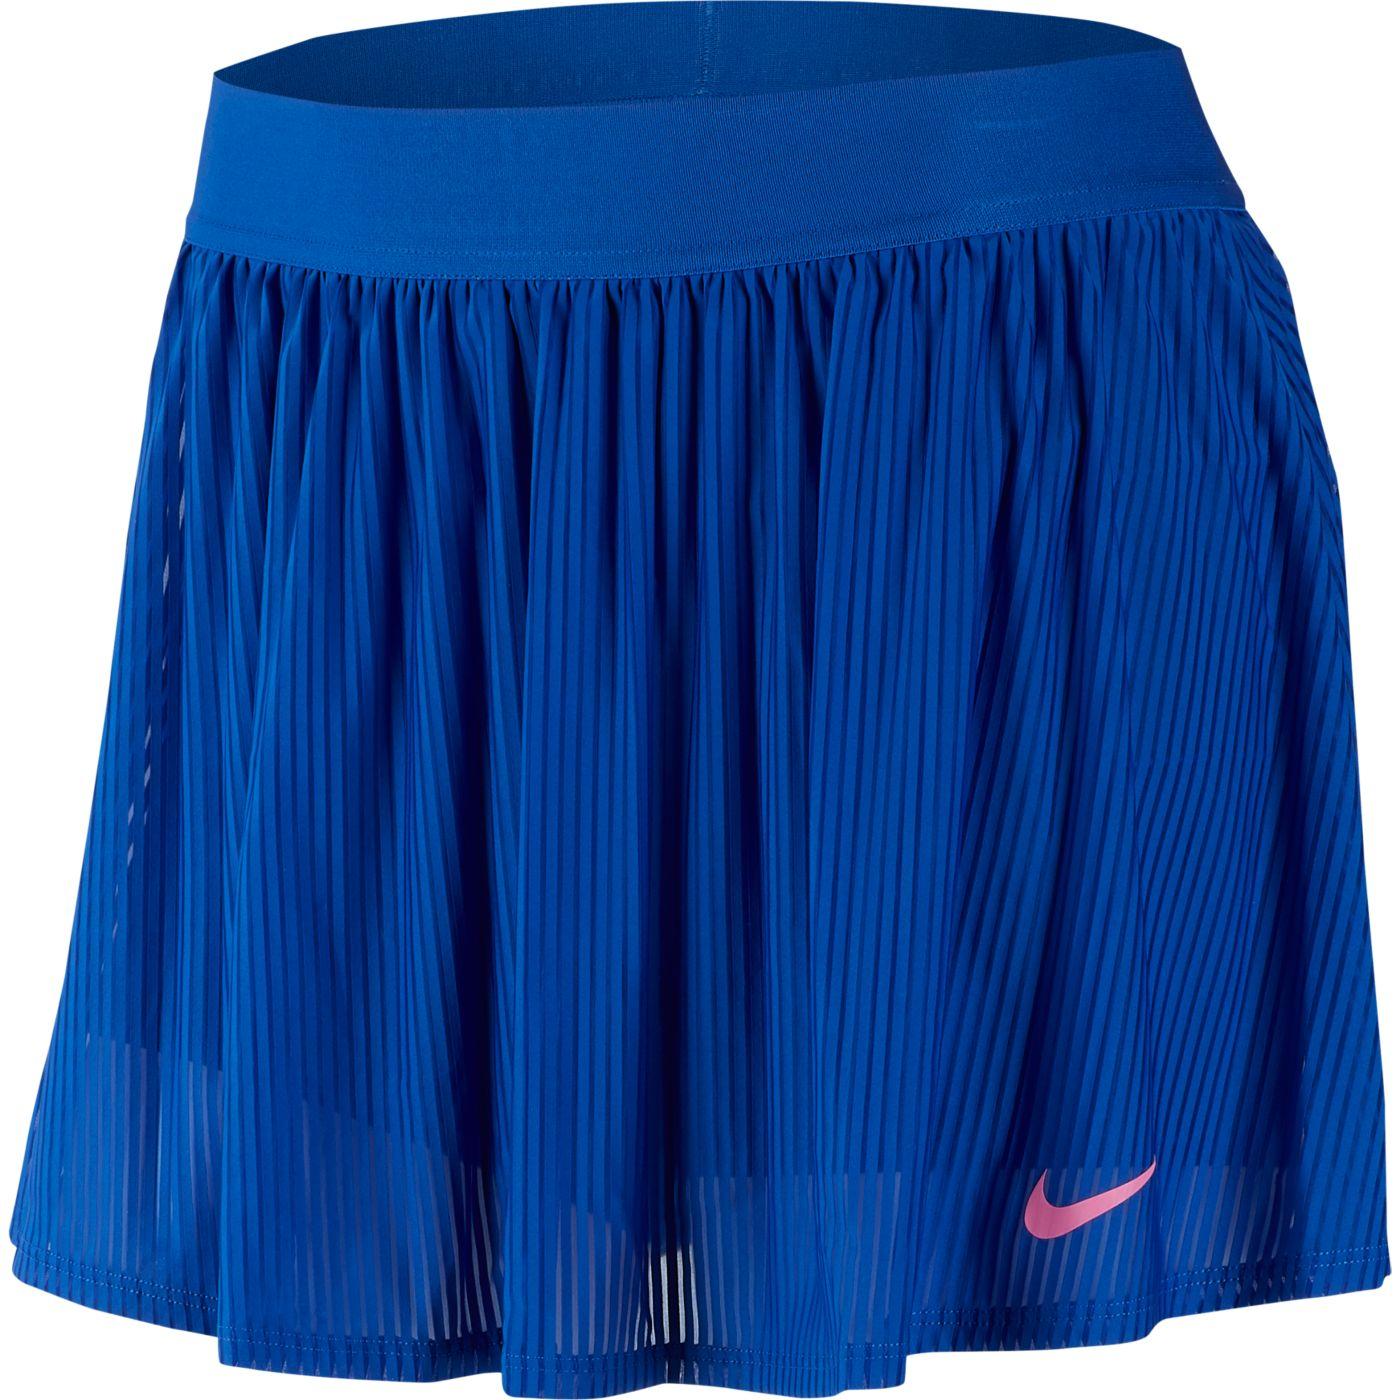 Nike Women's Maria Tennis Skirt